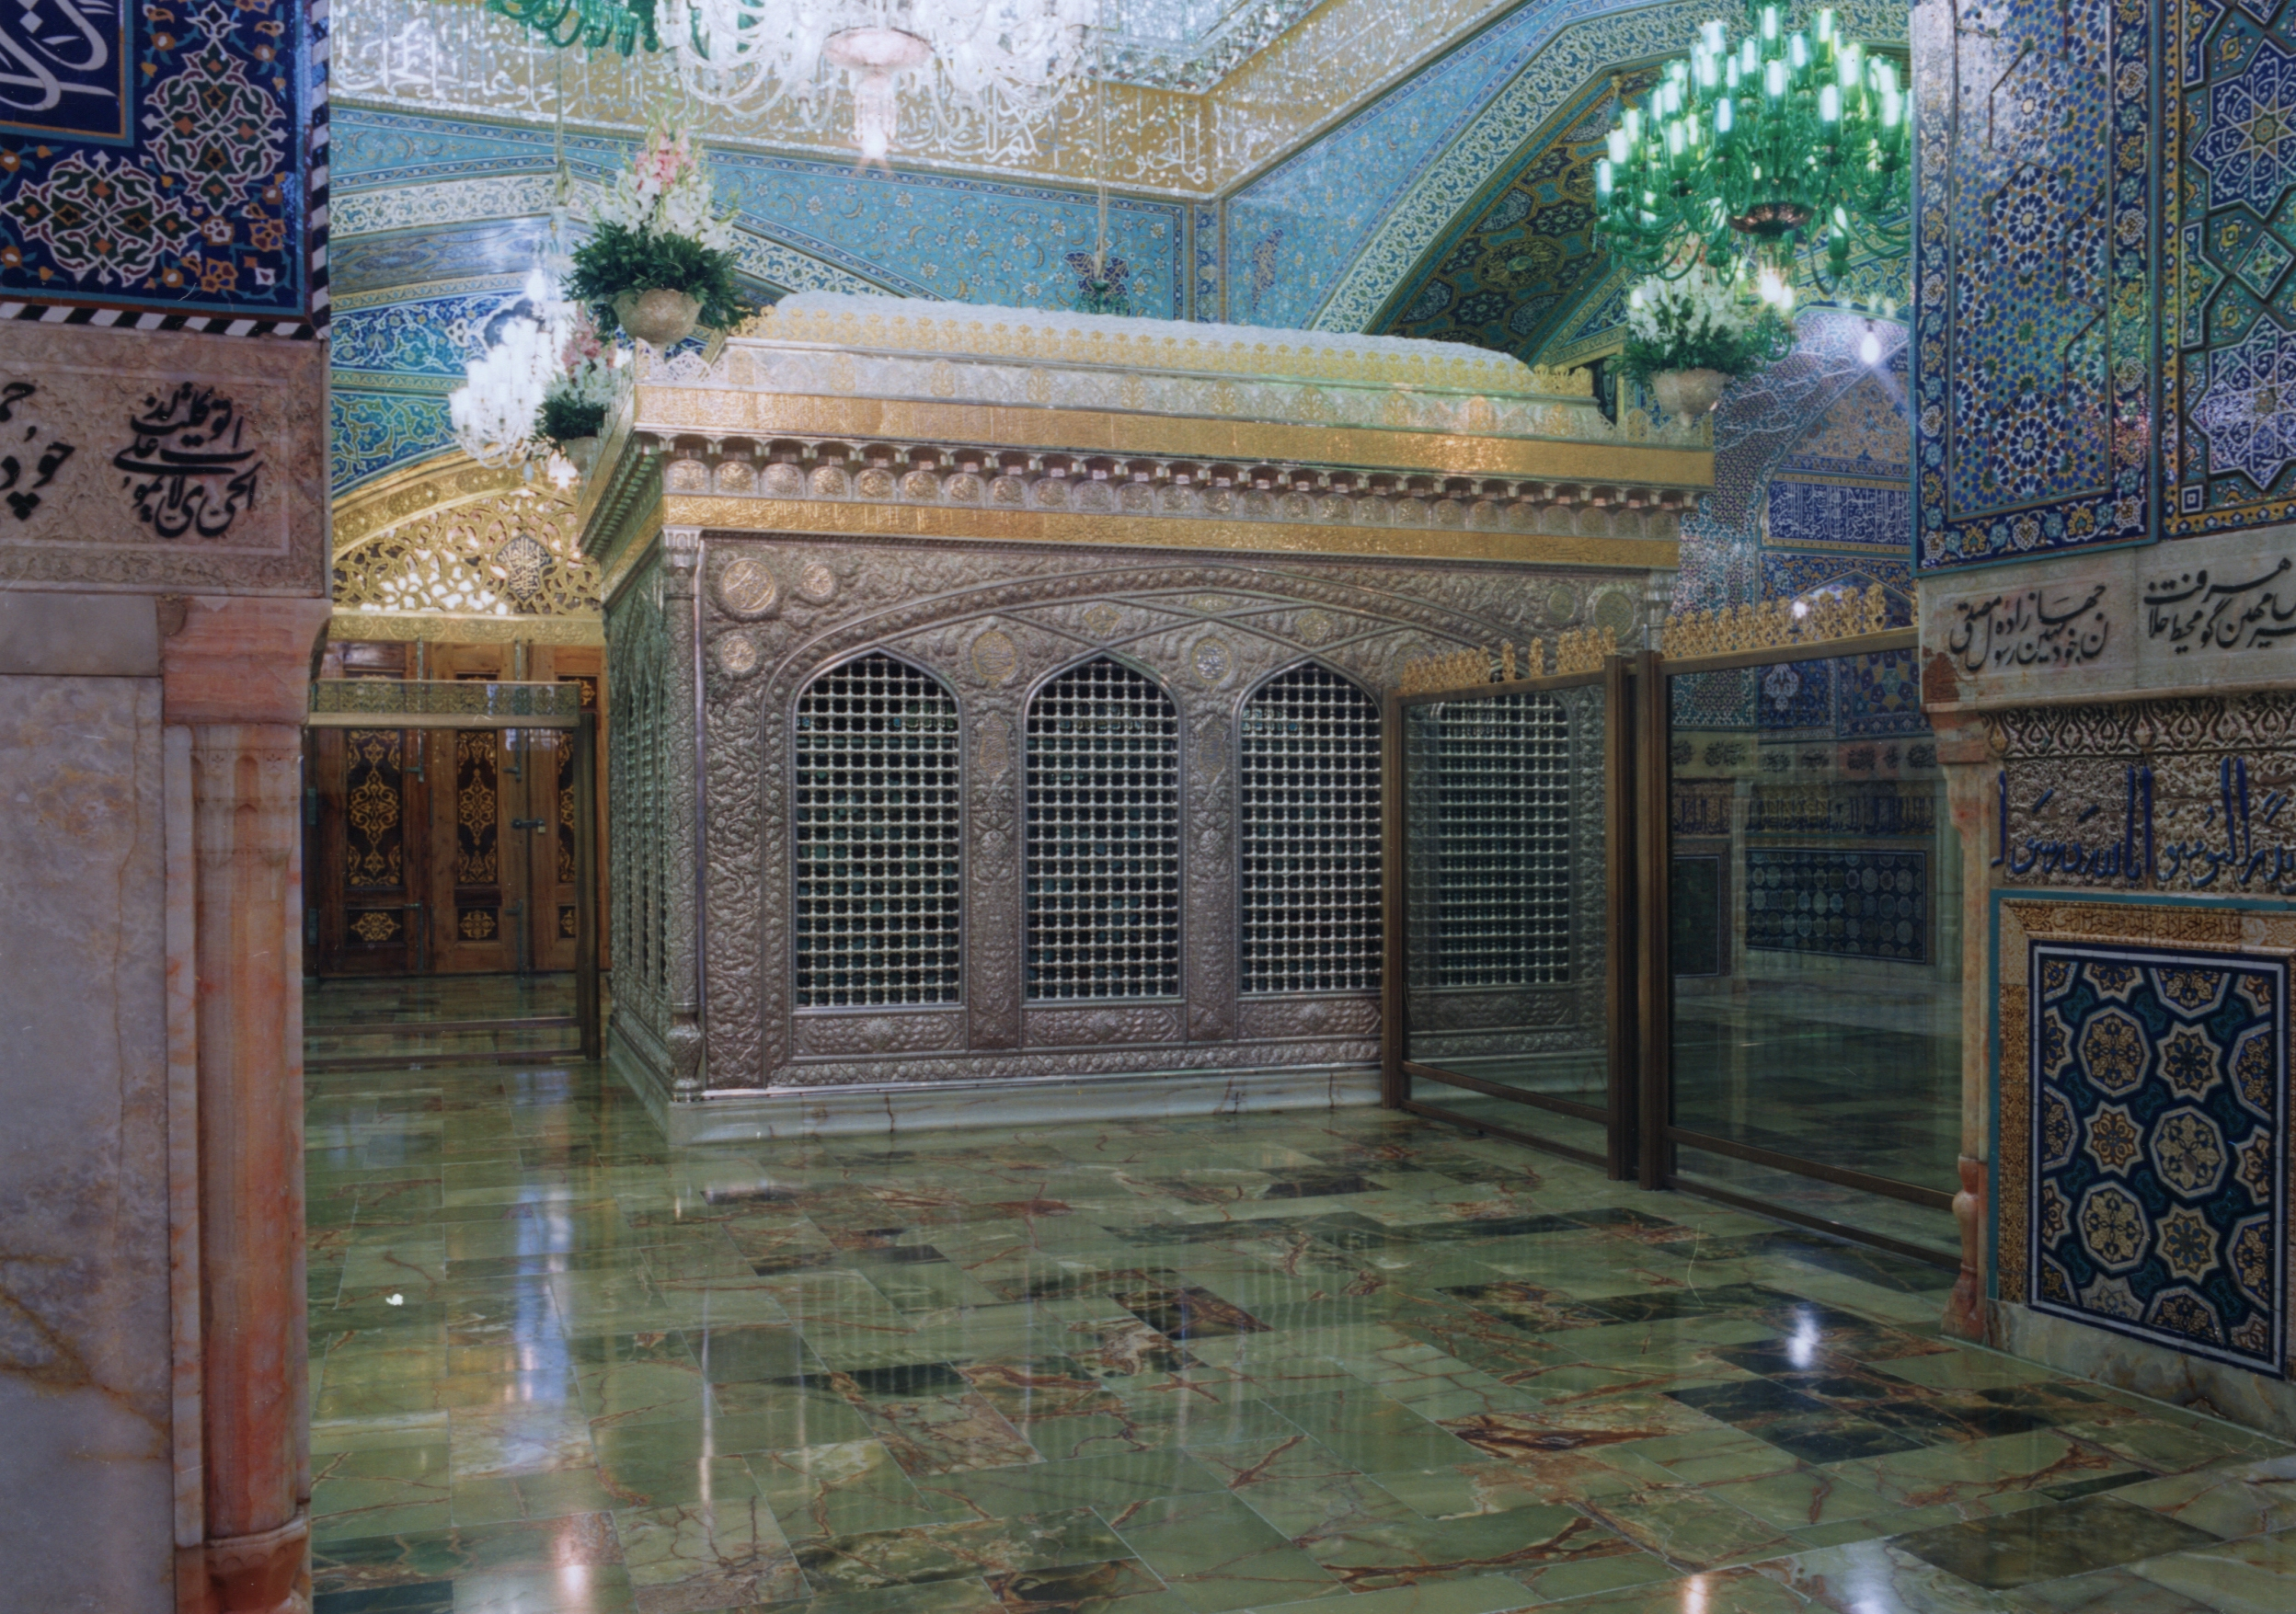 السلام علیک یا مولا یا اباالحسن علی بن موسی الرضا المرتضی